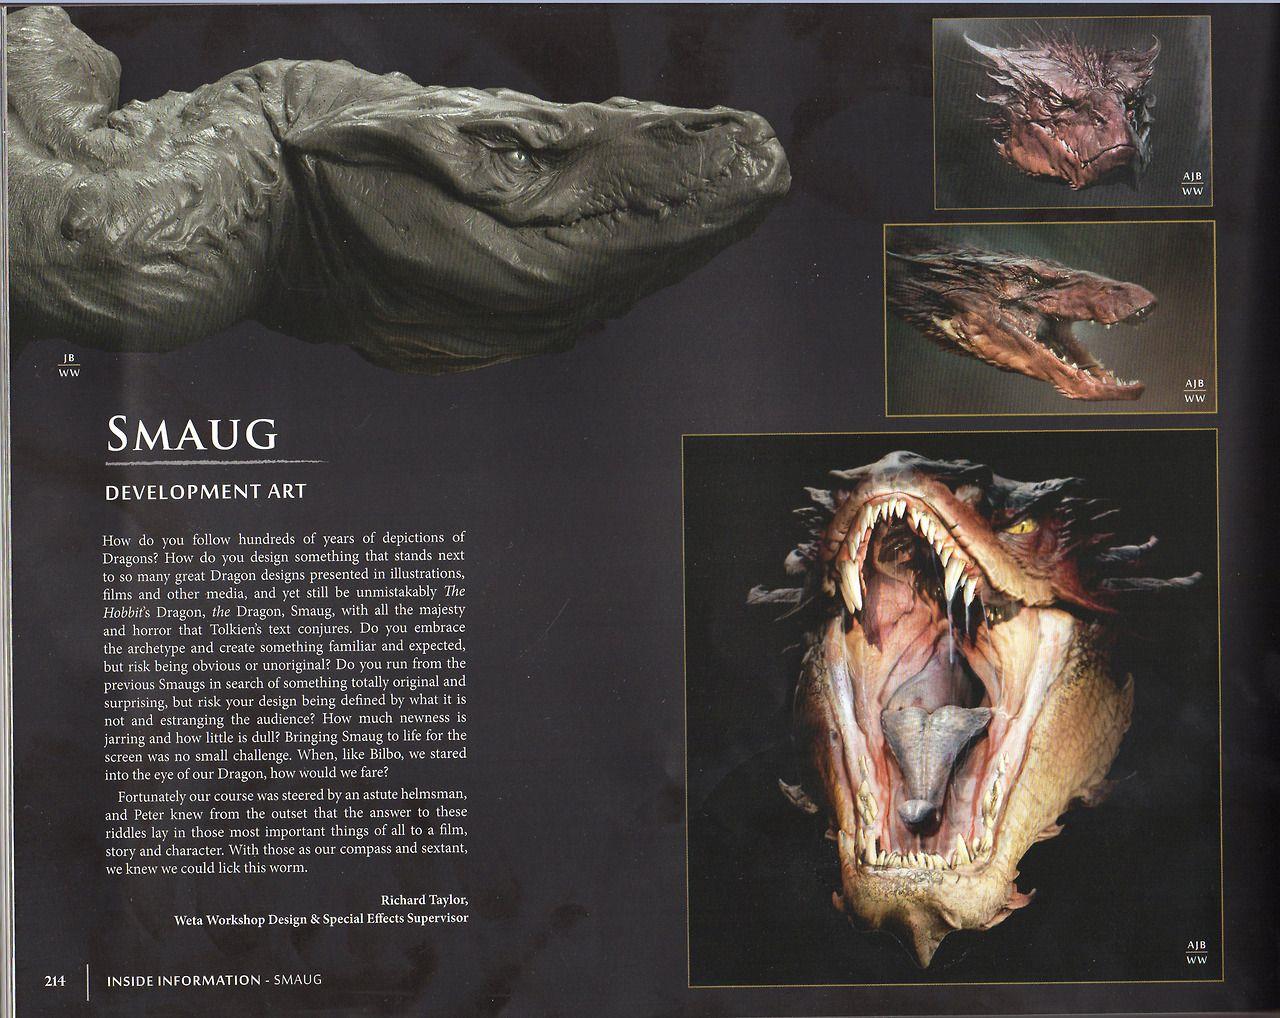 The Hobbit - Smaug design. #dragon #film #creature #concept #art #model #sculpt #monster #visual #effect #fantasy